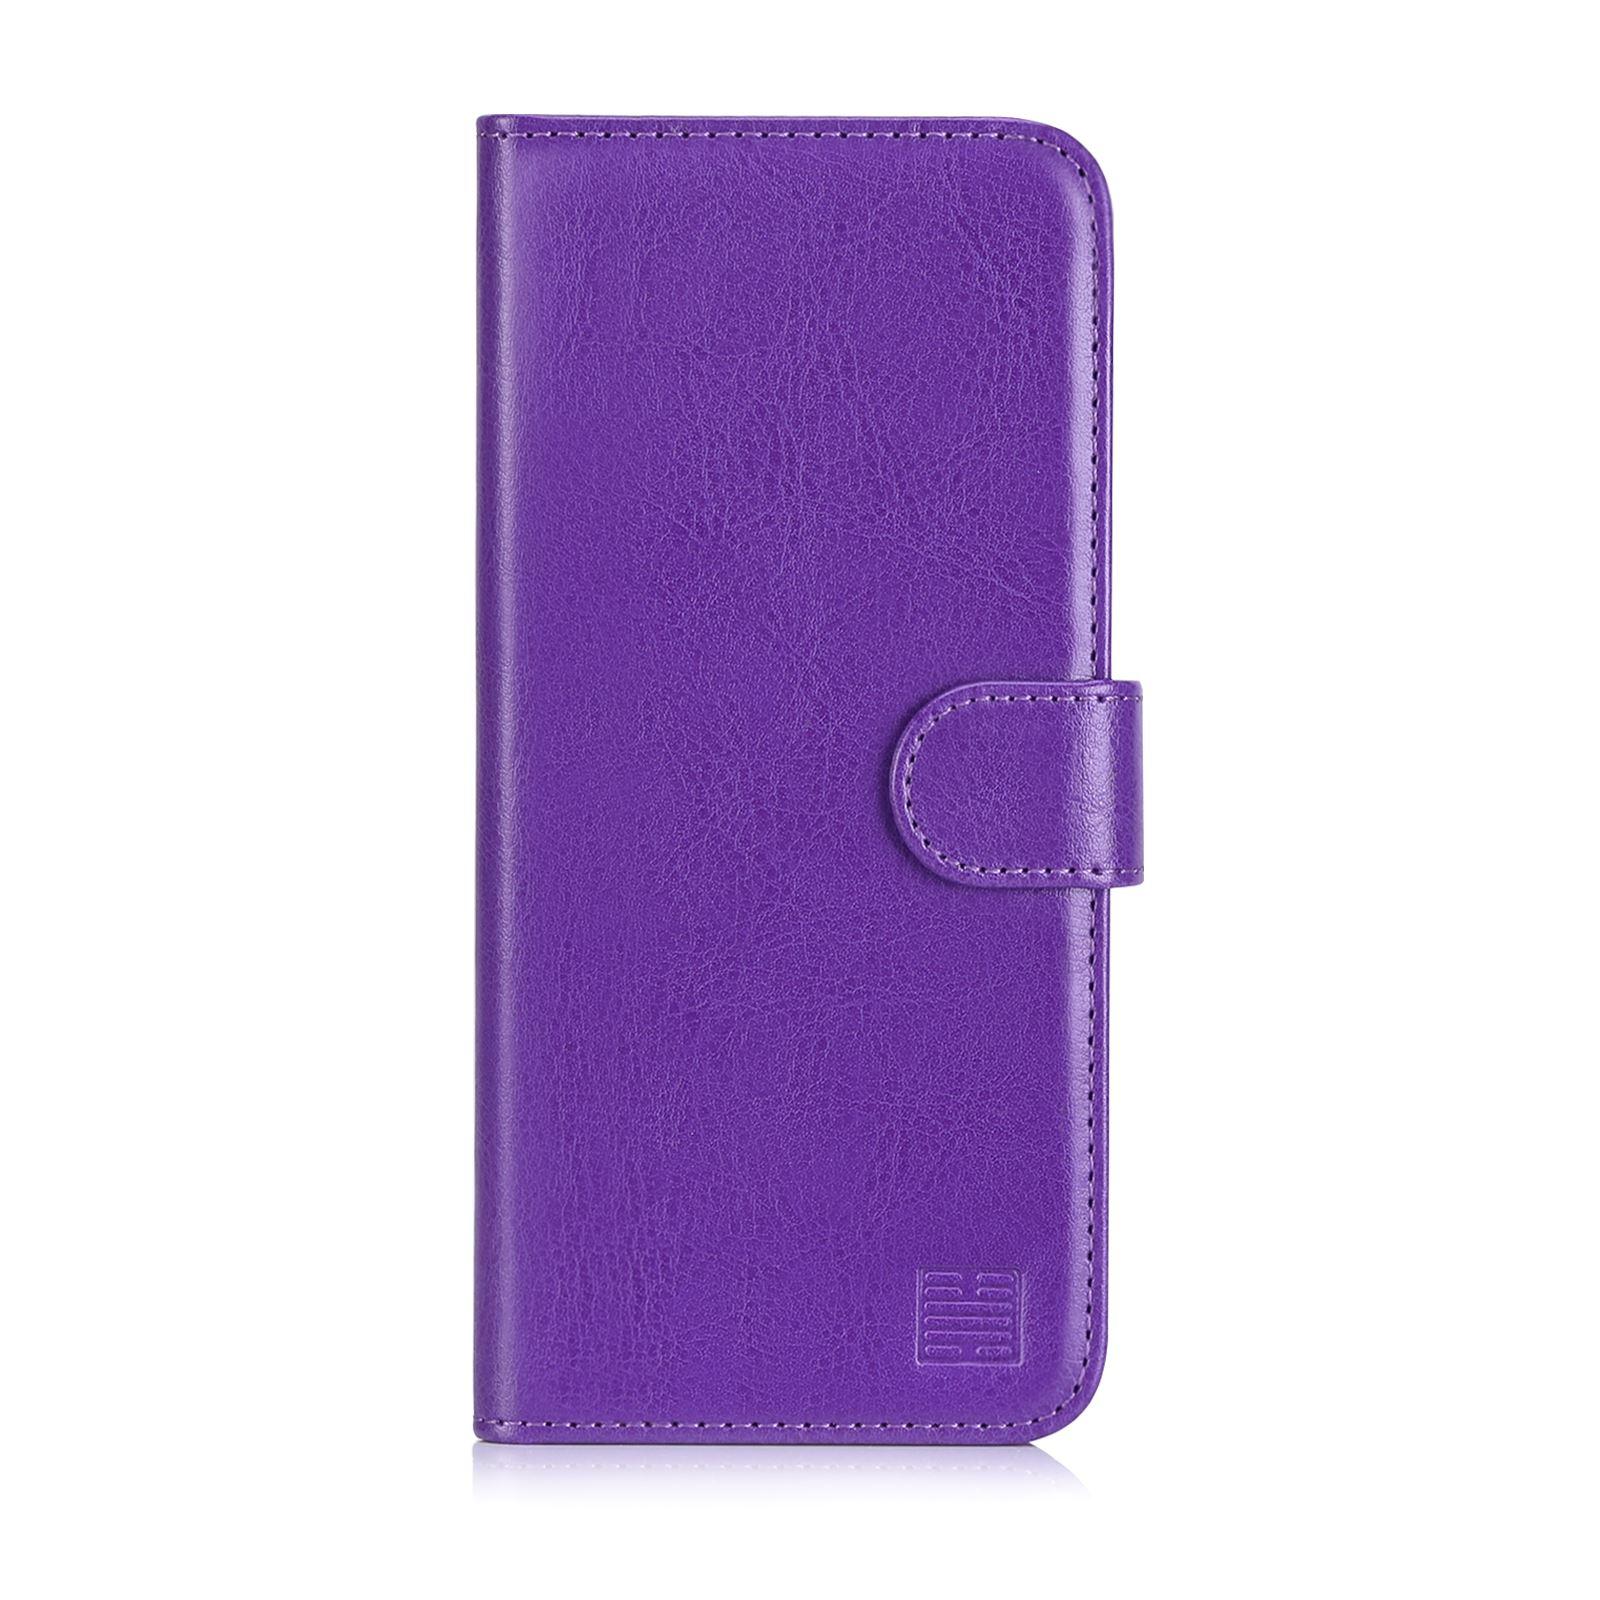 0adee06a947 32nd LIBRO SERIE – PU Funda Cartera Plegable Piel para Motorola Moto ...